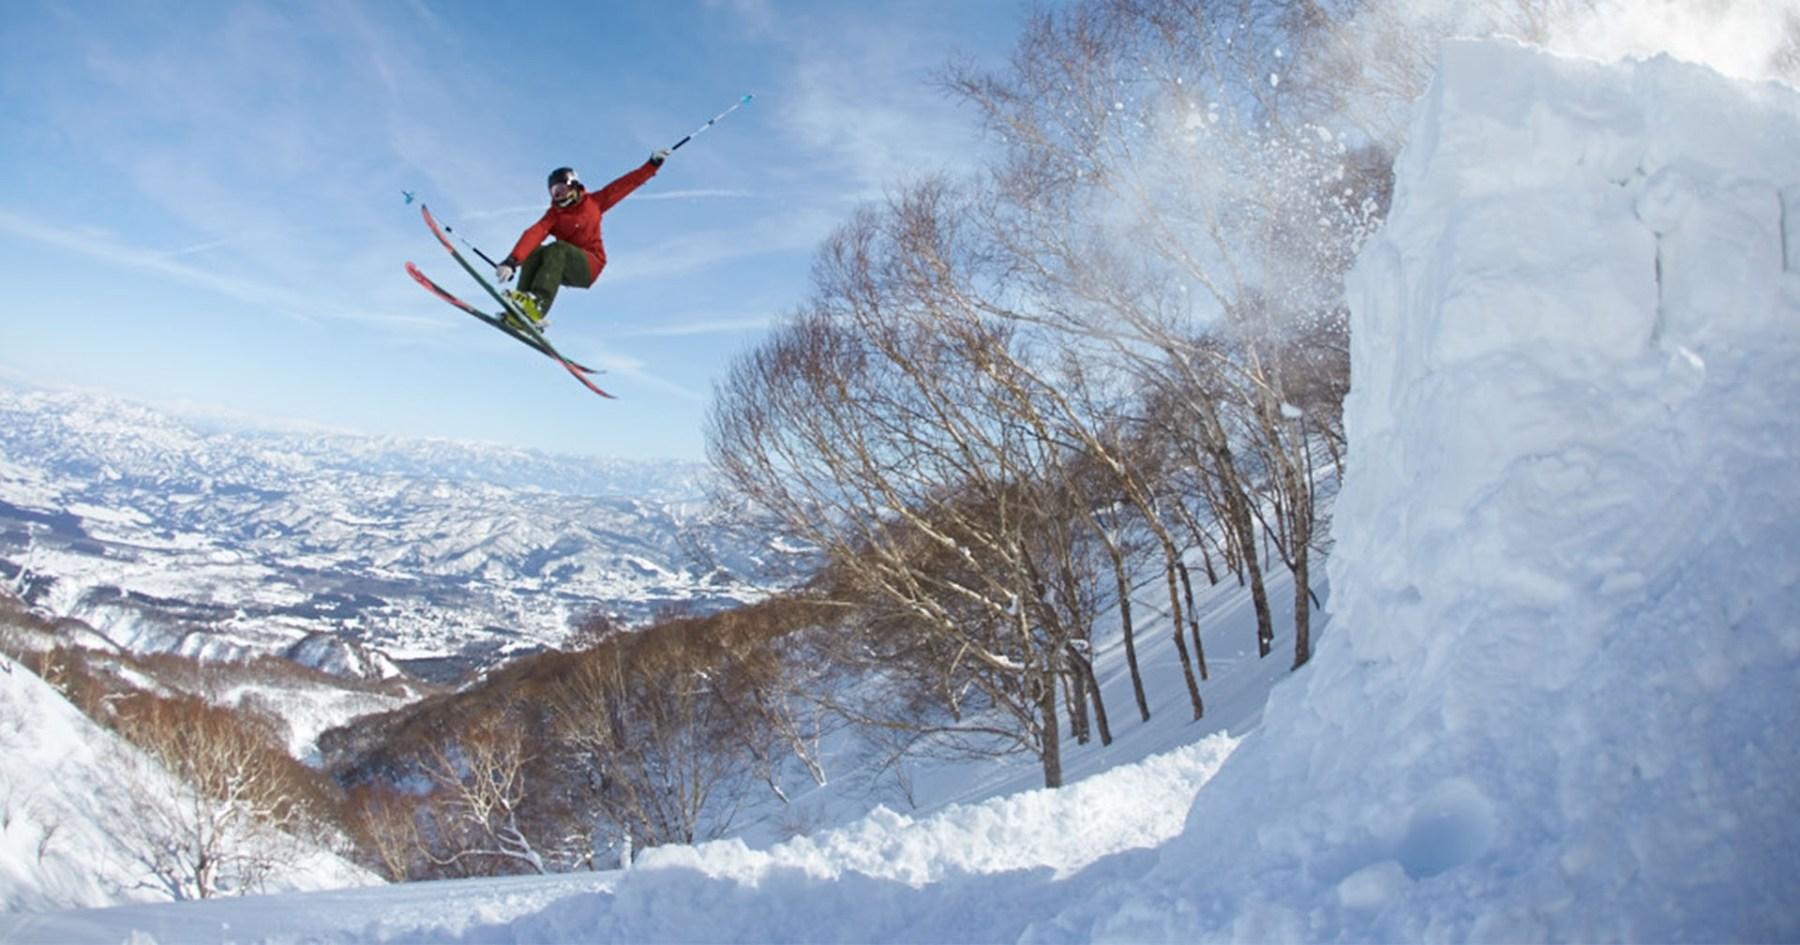 Win a Weeklong Ski Trip to Japan